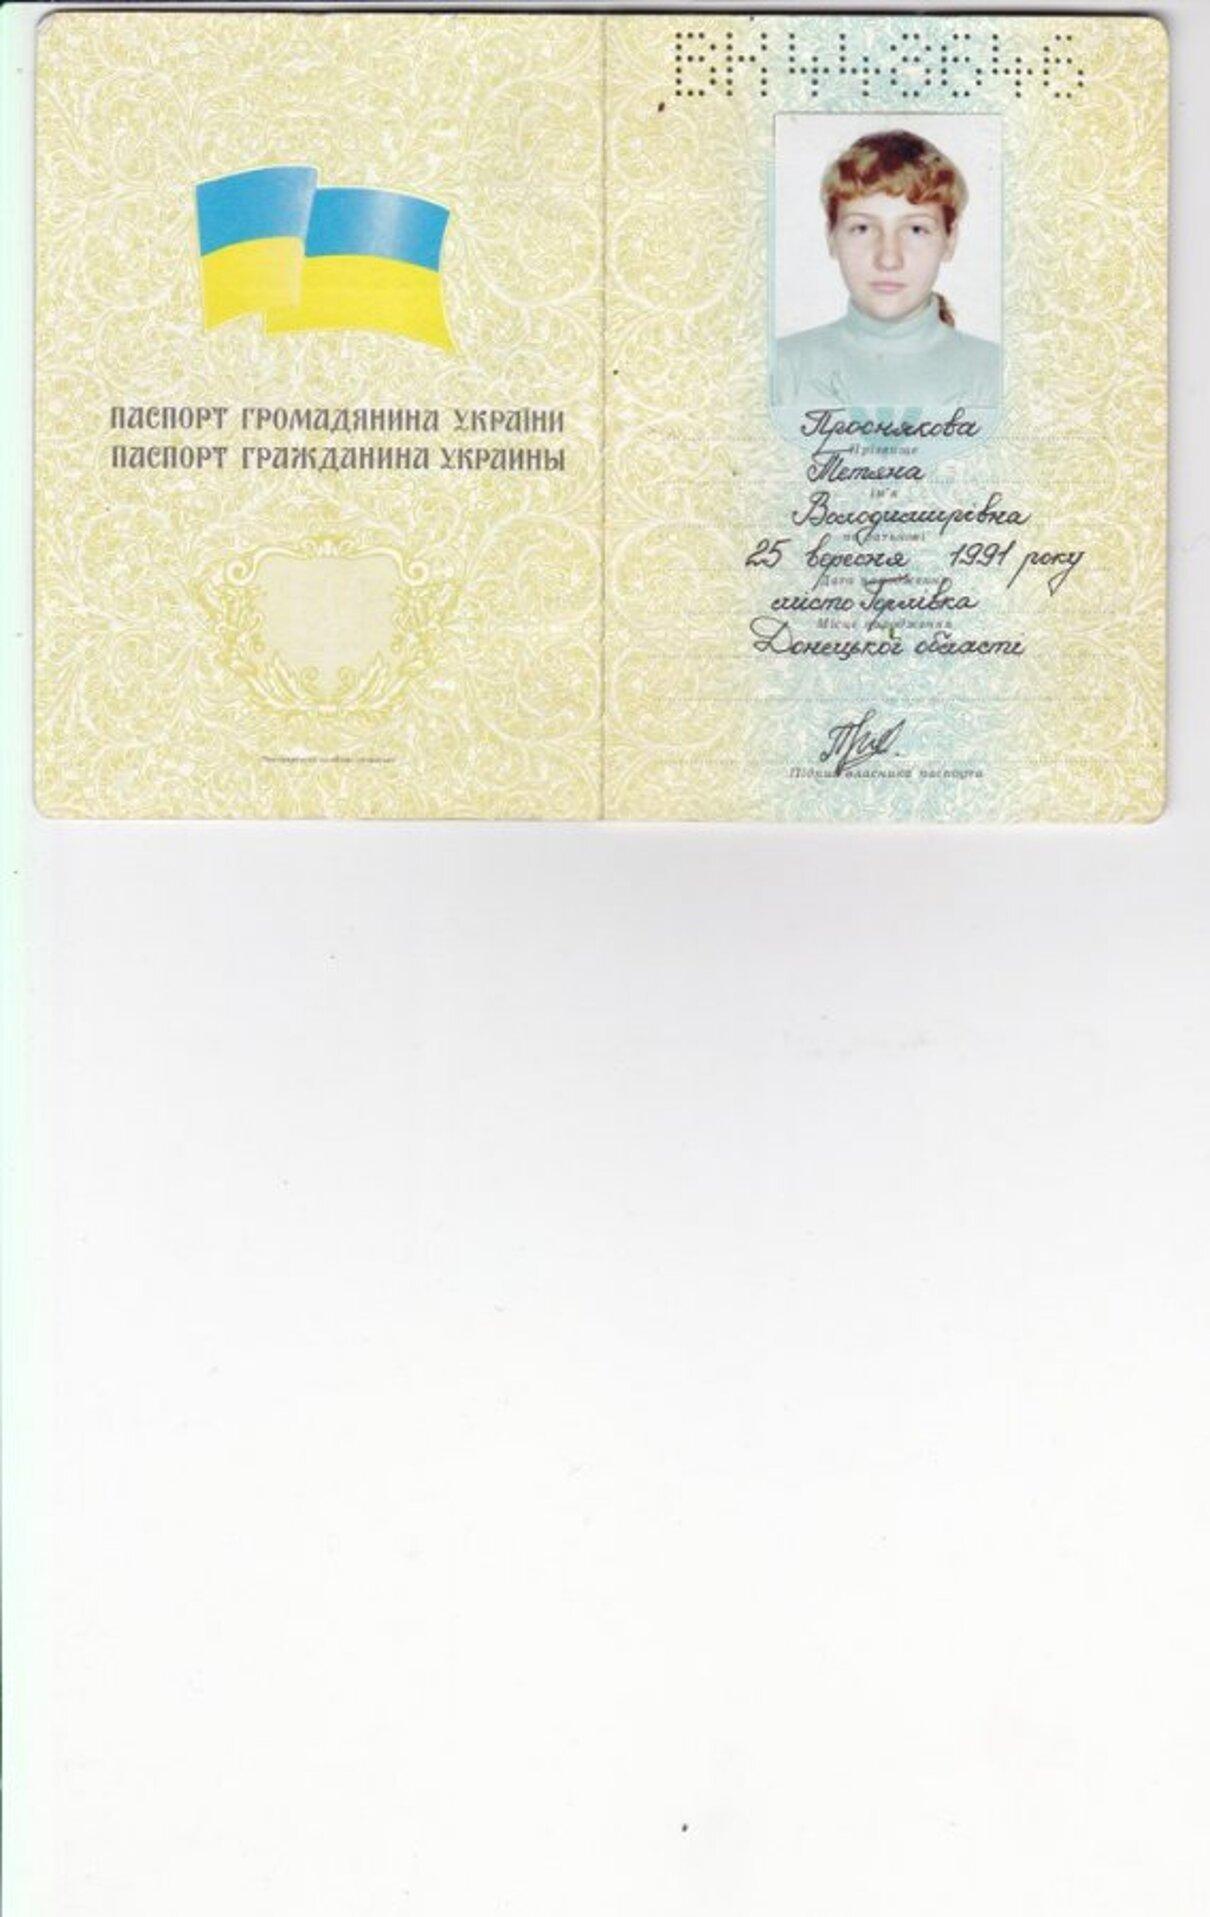 Жалоба-отзыв: 4188373027305108 Татьяна Проснякова - Мошенница